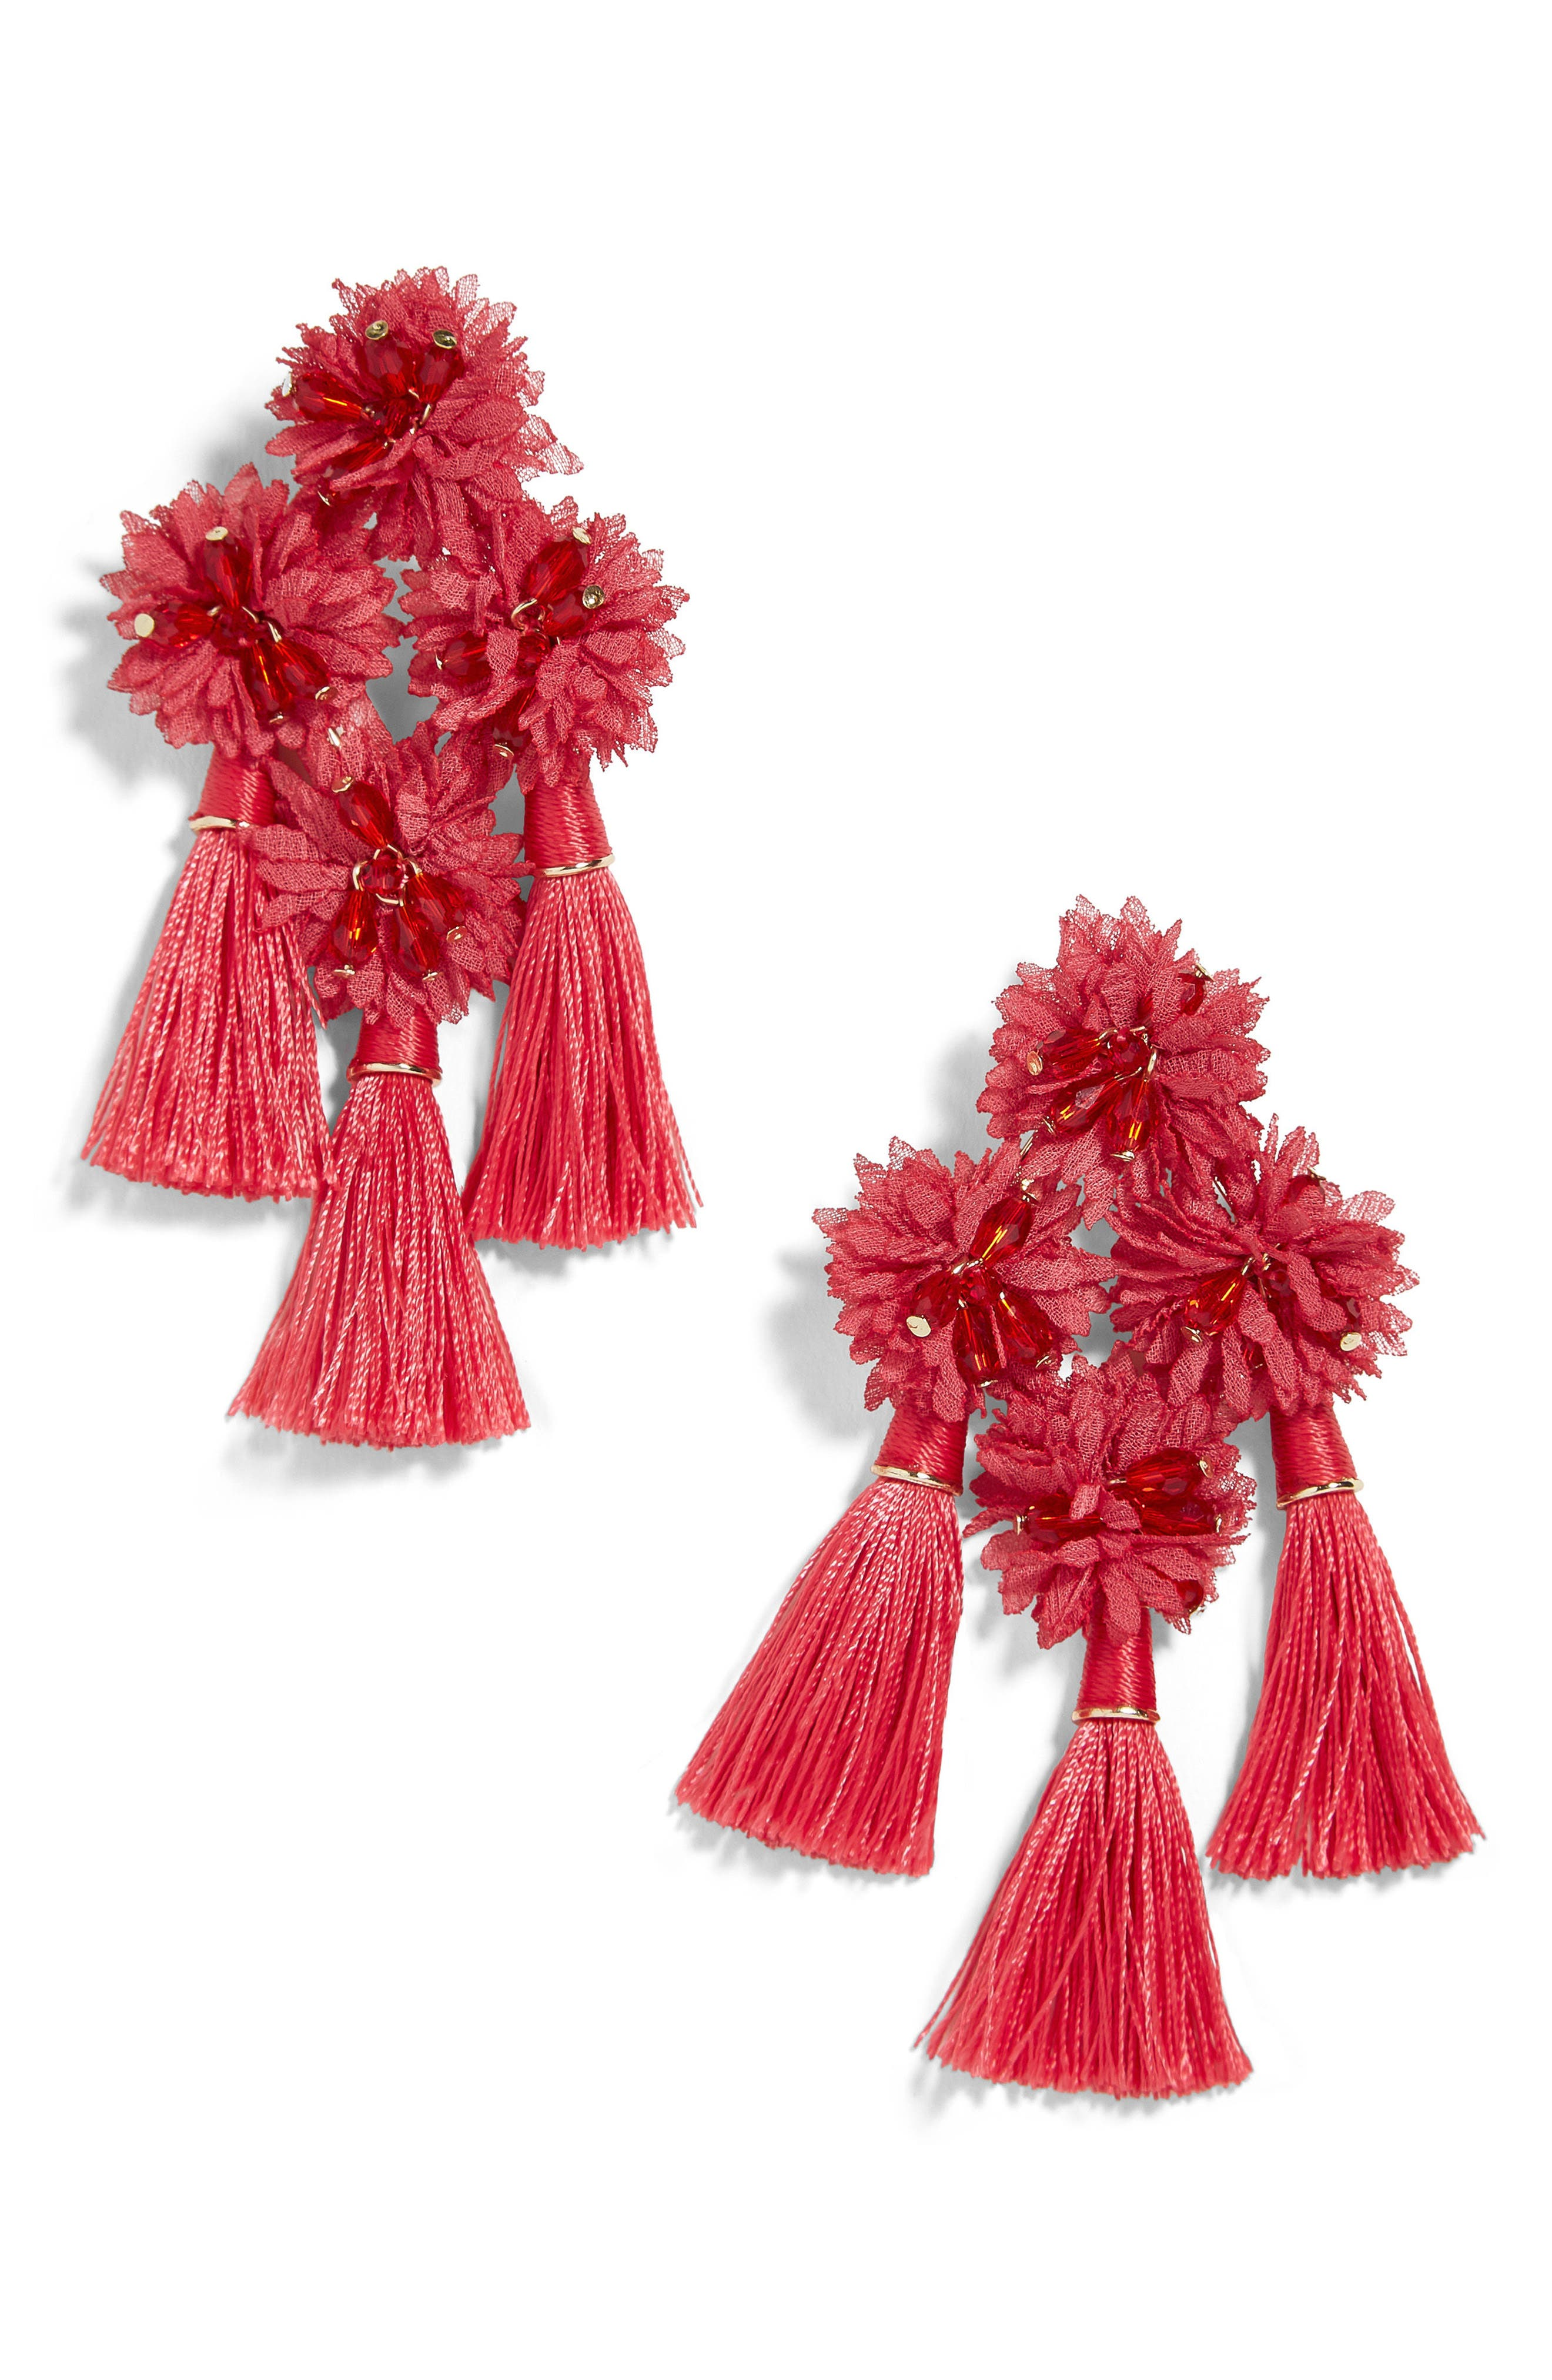 Verenice Tassel Earings,                             Main thumbnail 1, color,                             RED